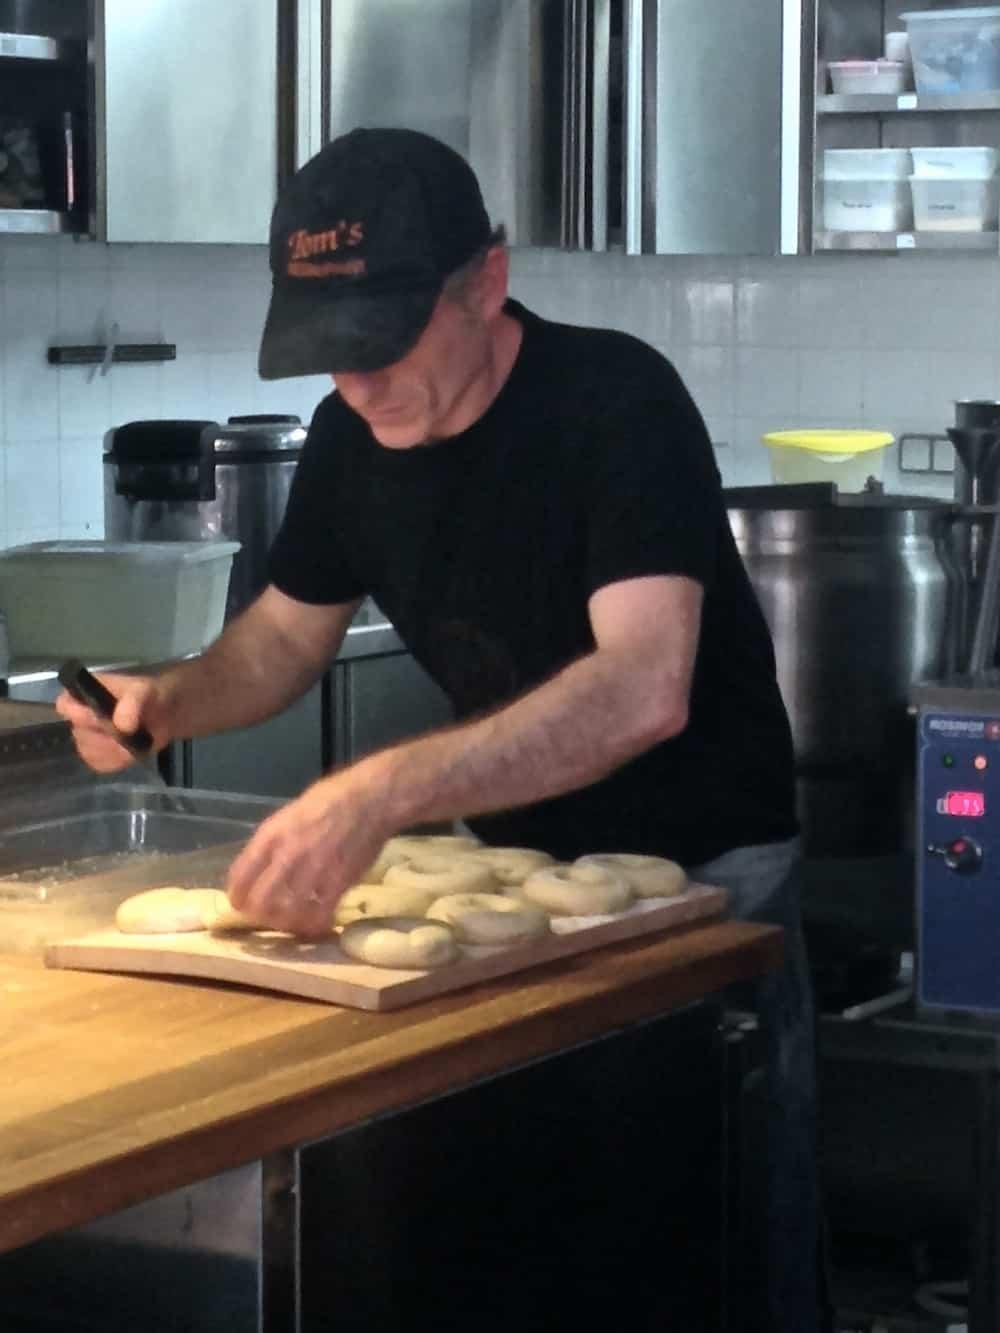 bob-s-bake-shop-marc-grossman